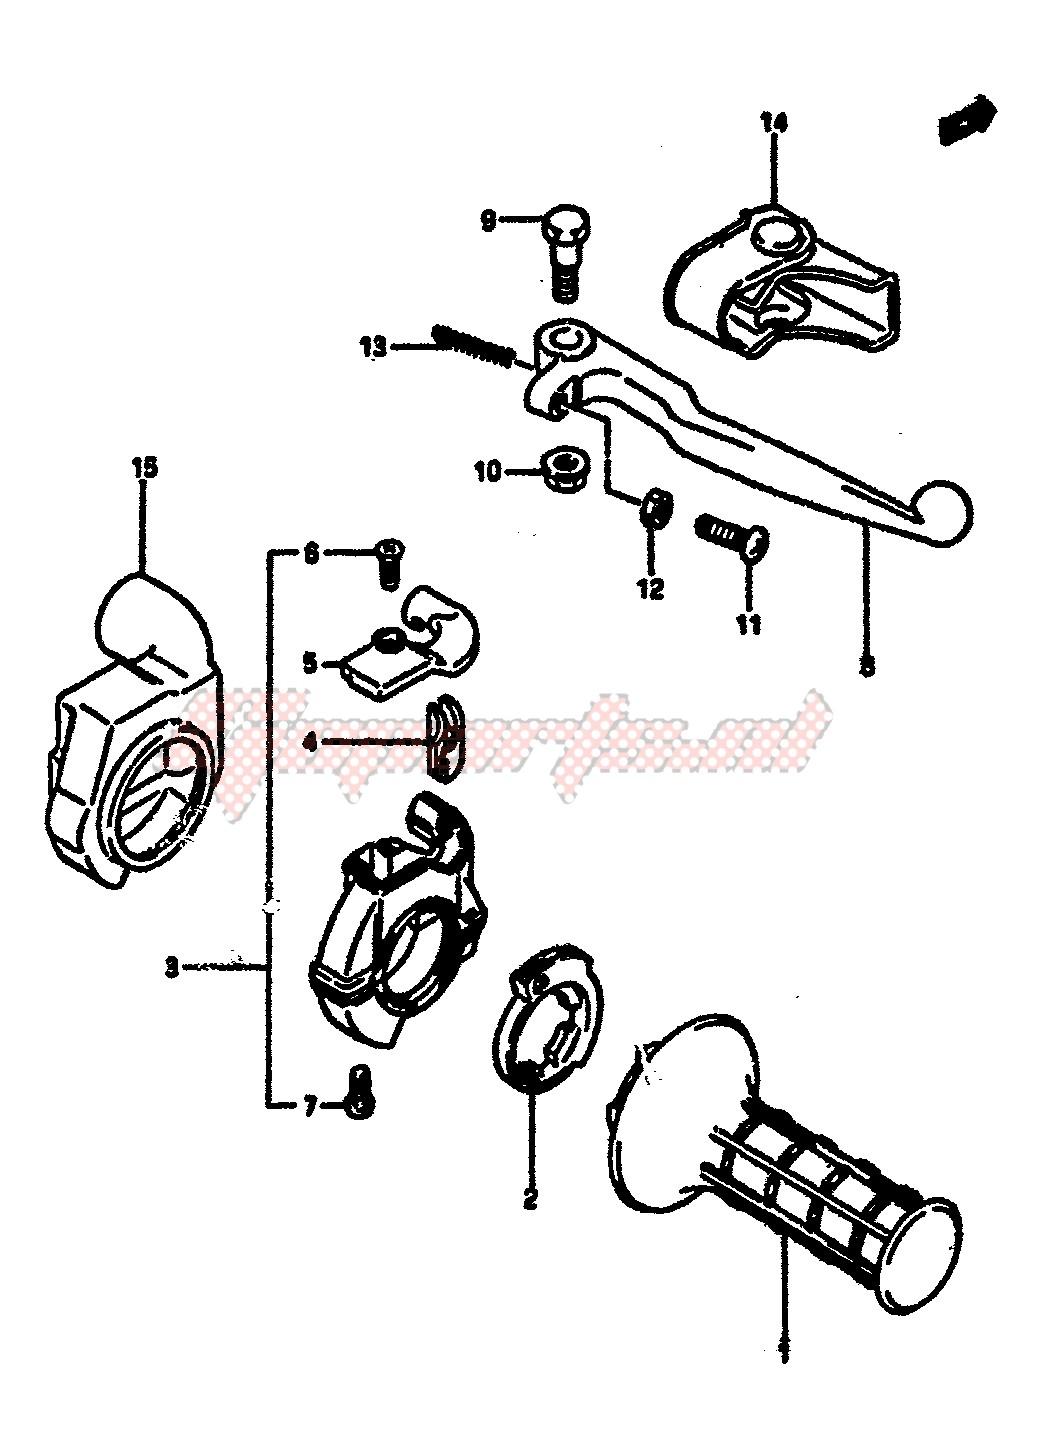 RIGHT HANDLE SWITCH (MODEL F) blueprint